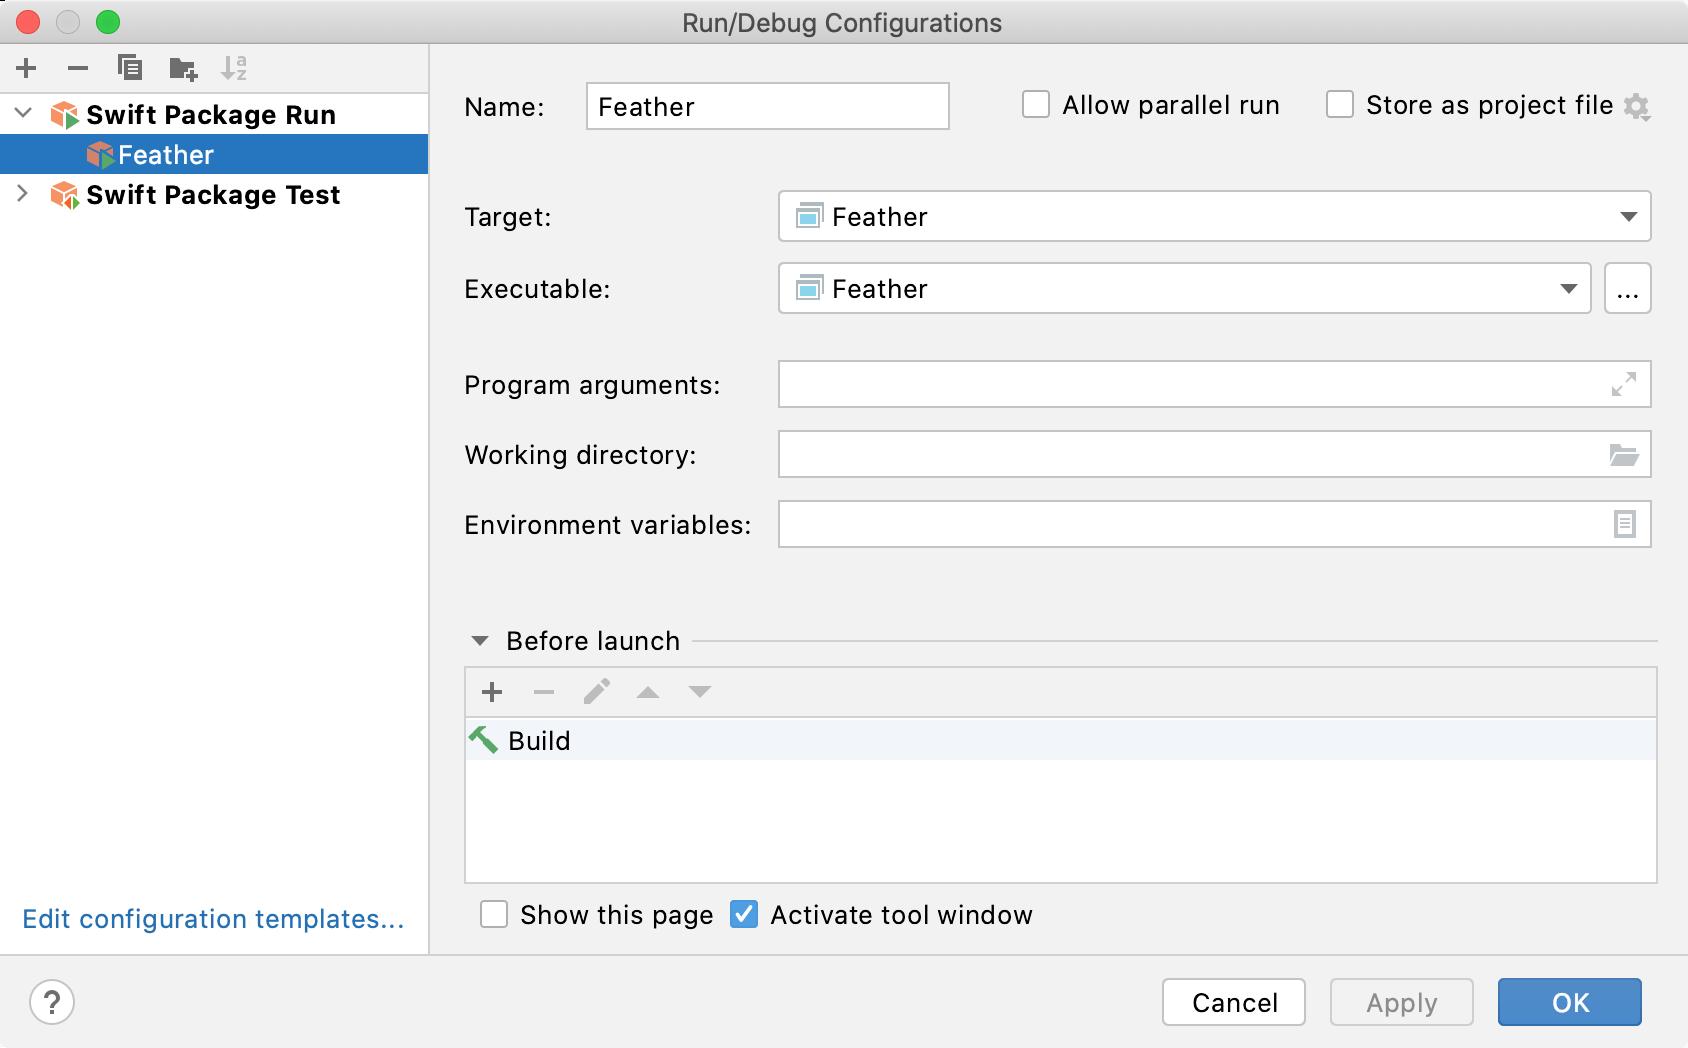 Swift package run/debug configuration